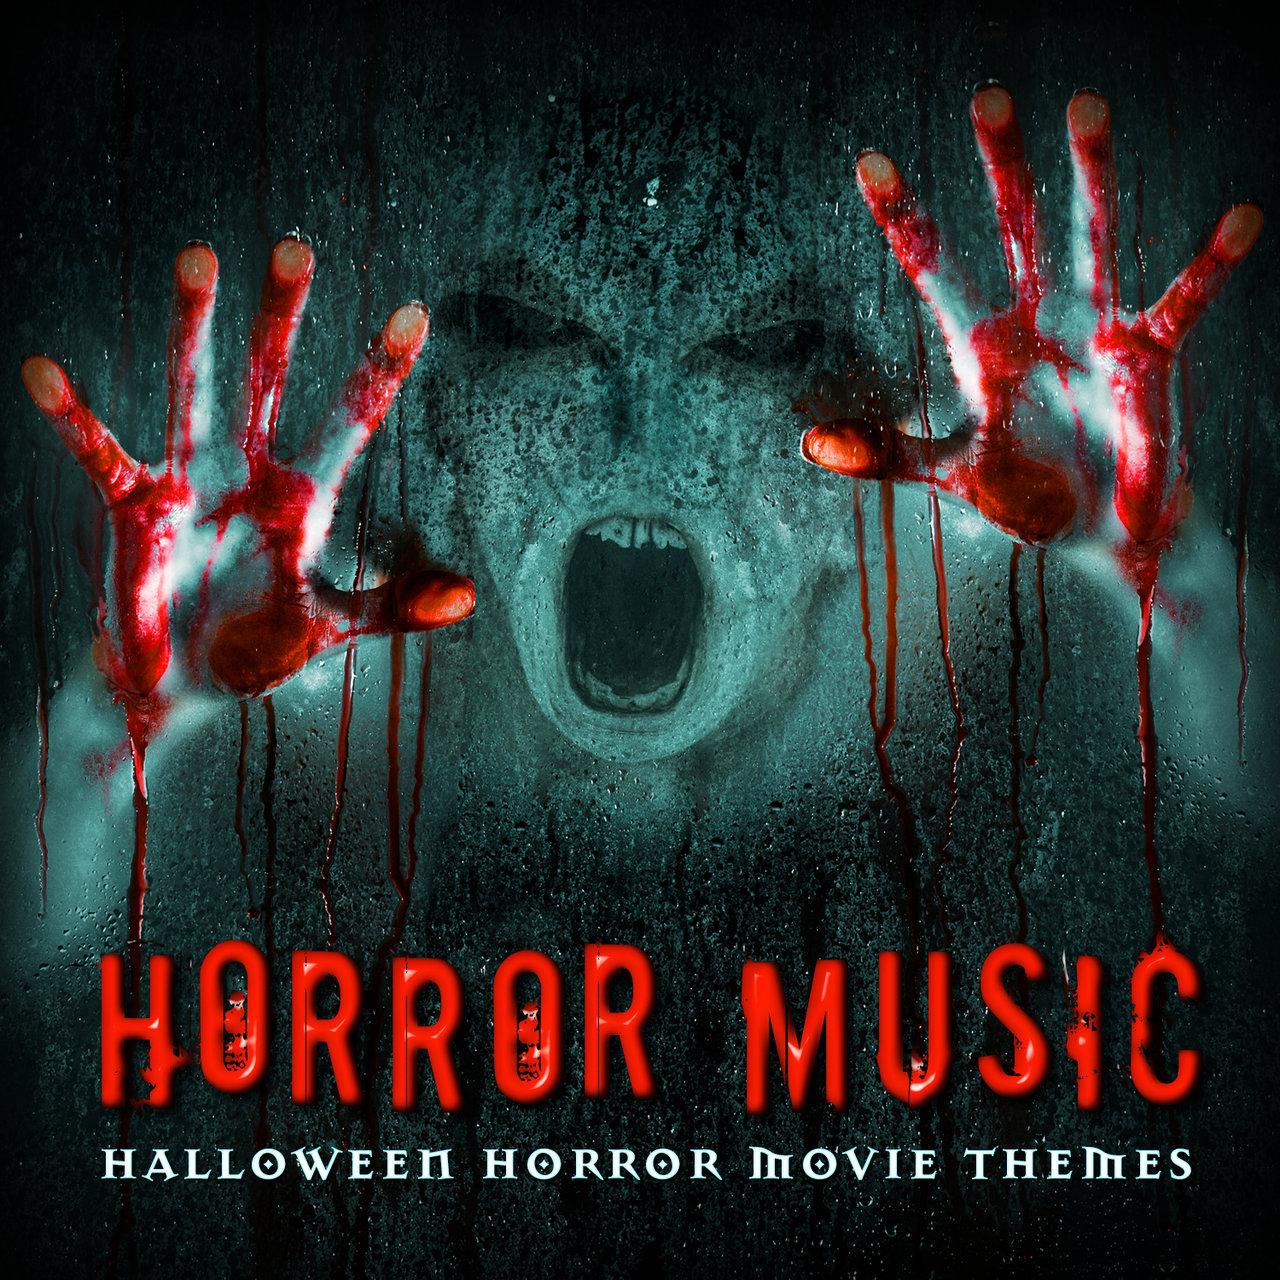 halloween horror images